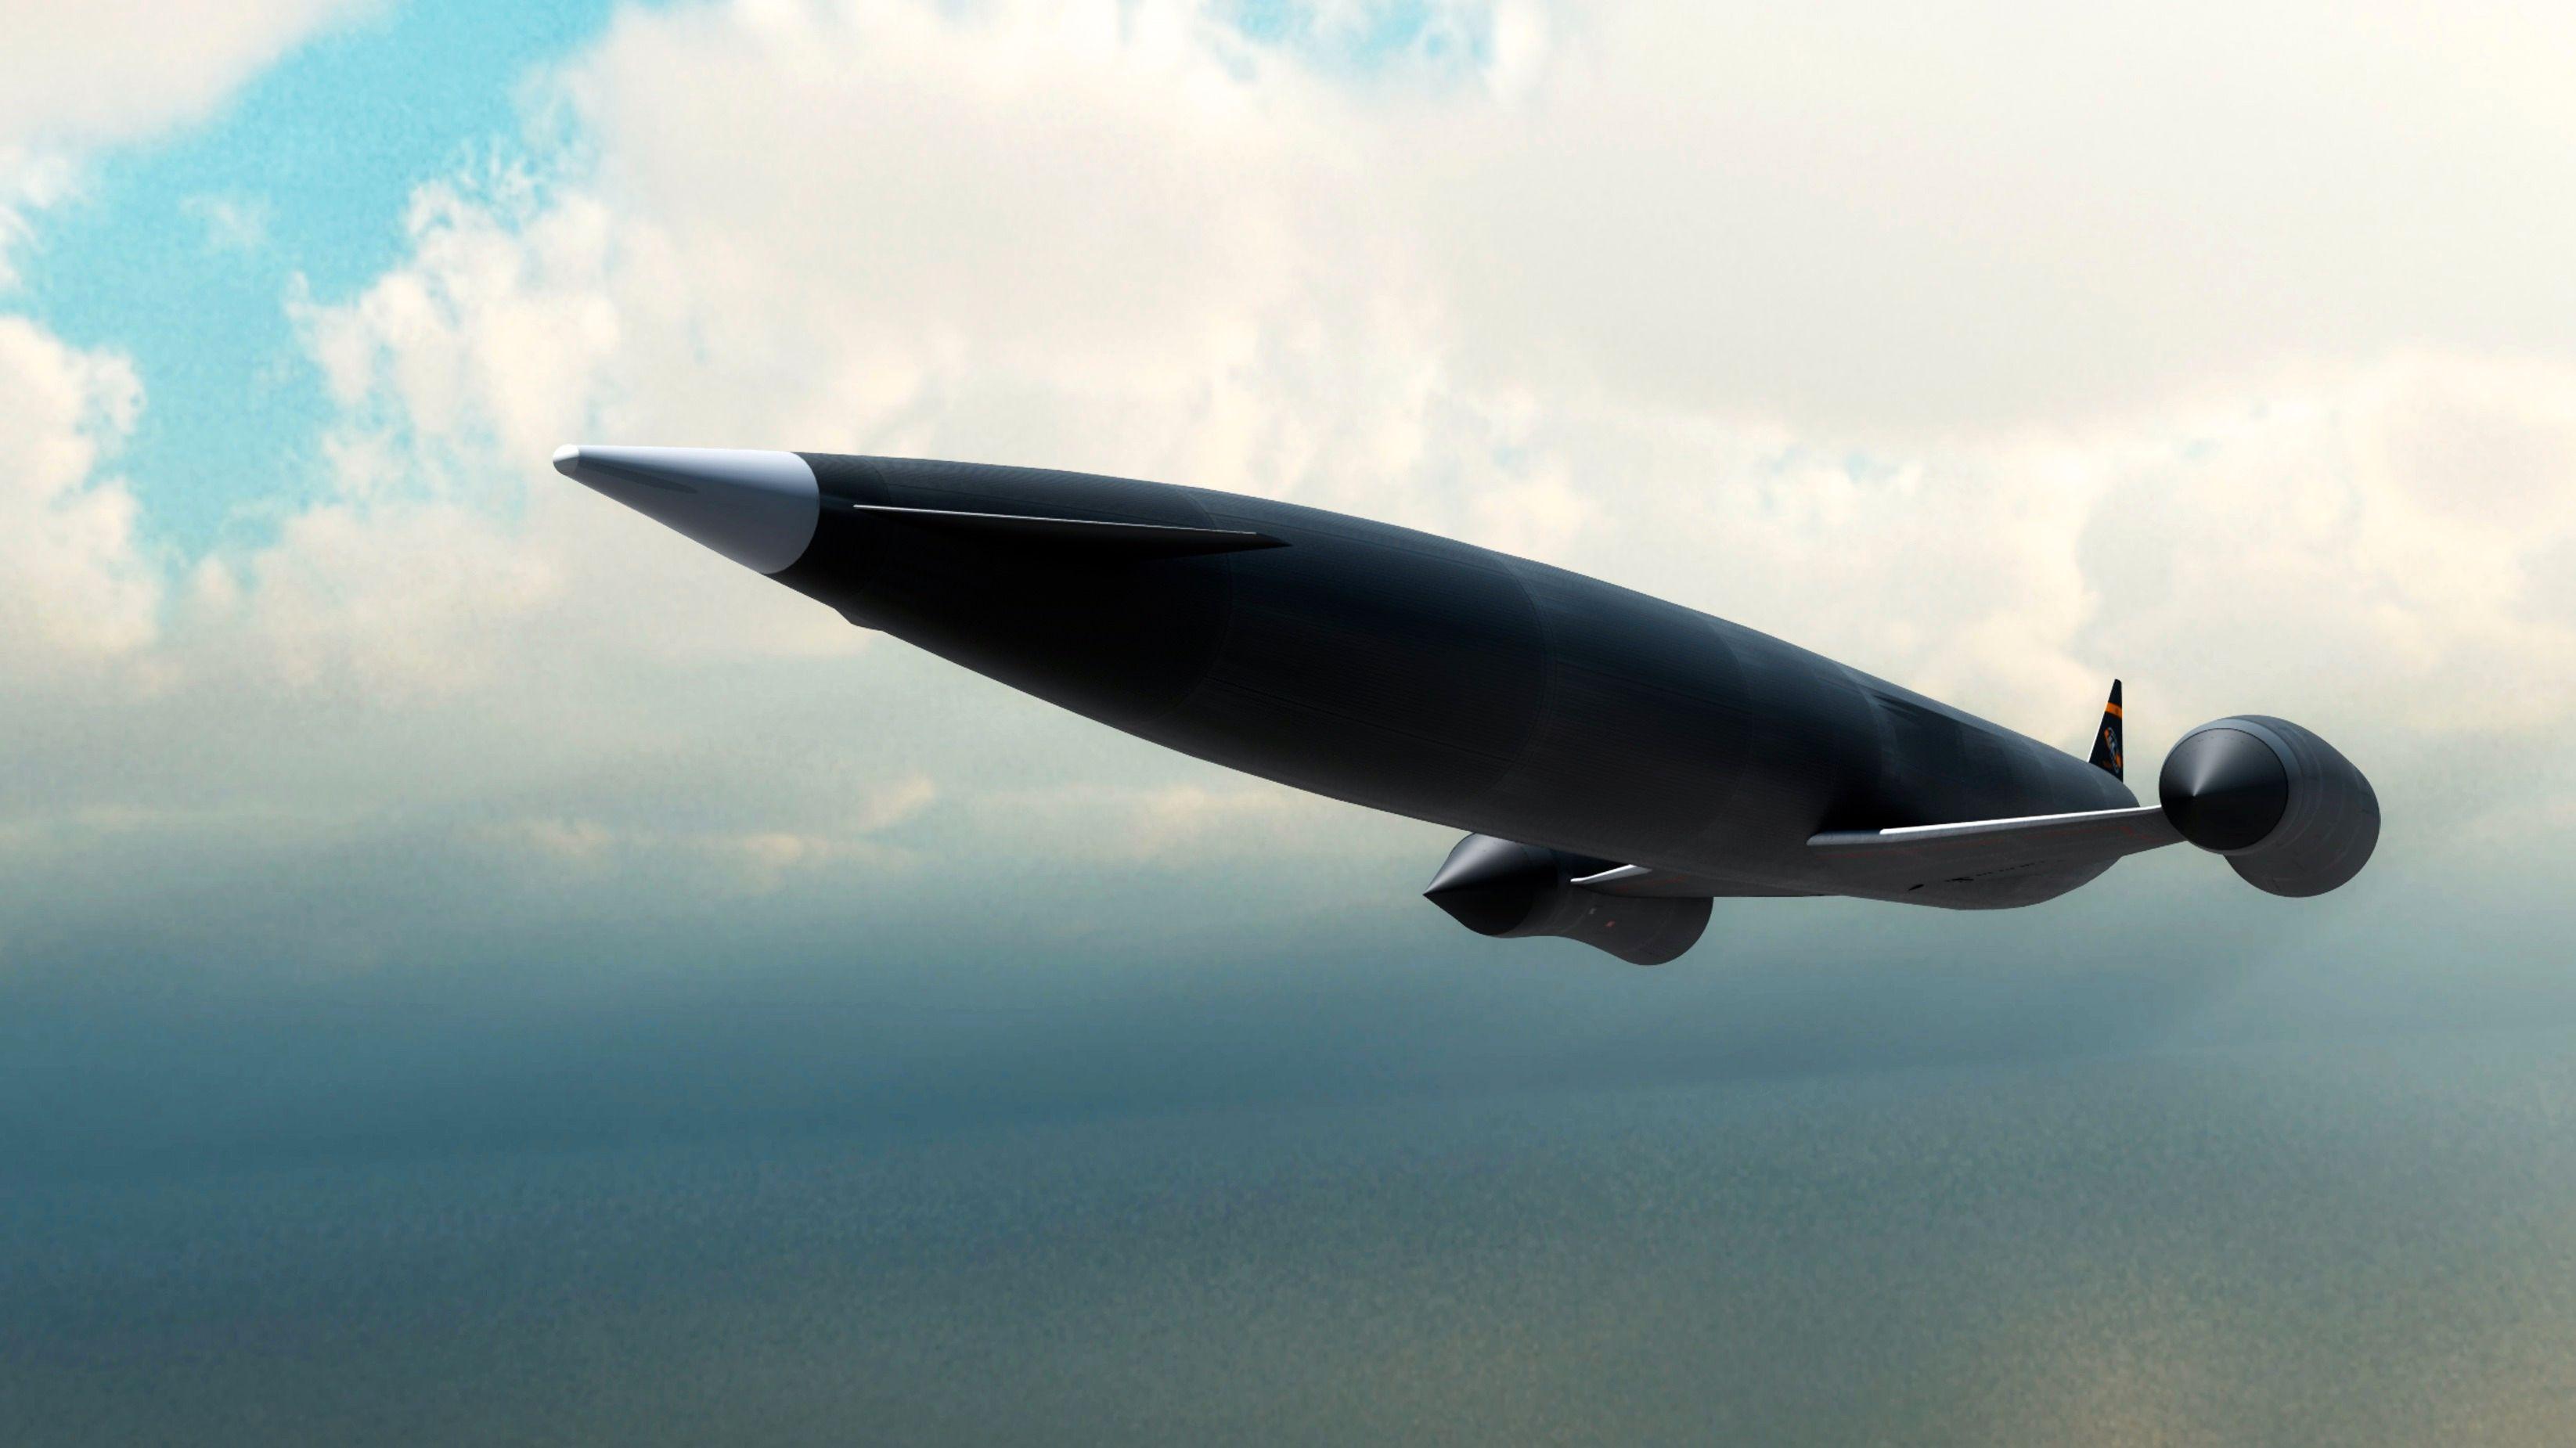 Dette flyet kan fly hvor som helst på 4 timer